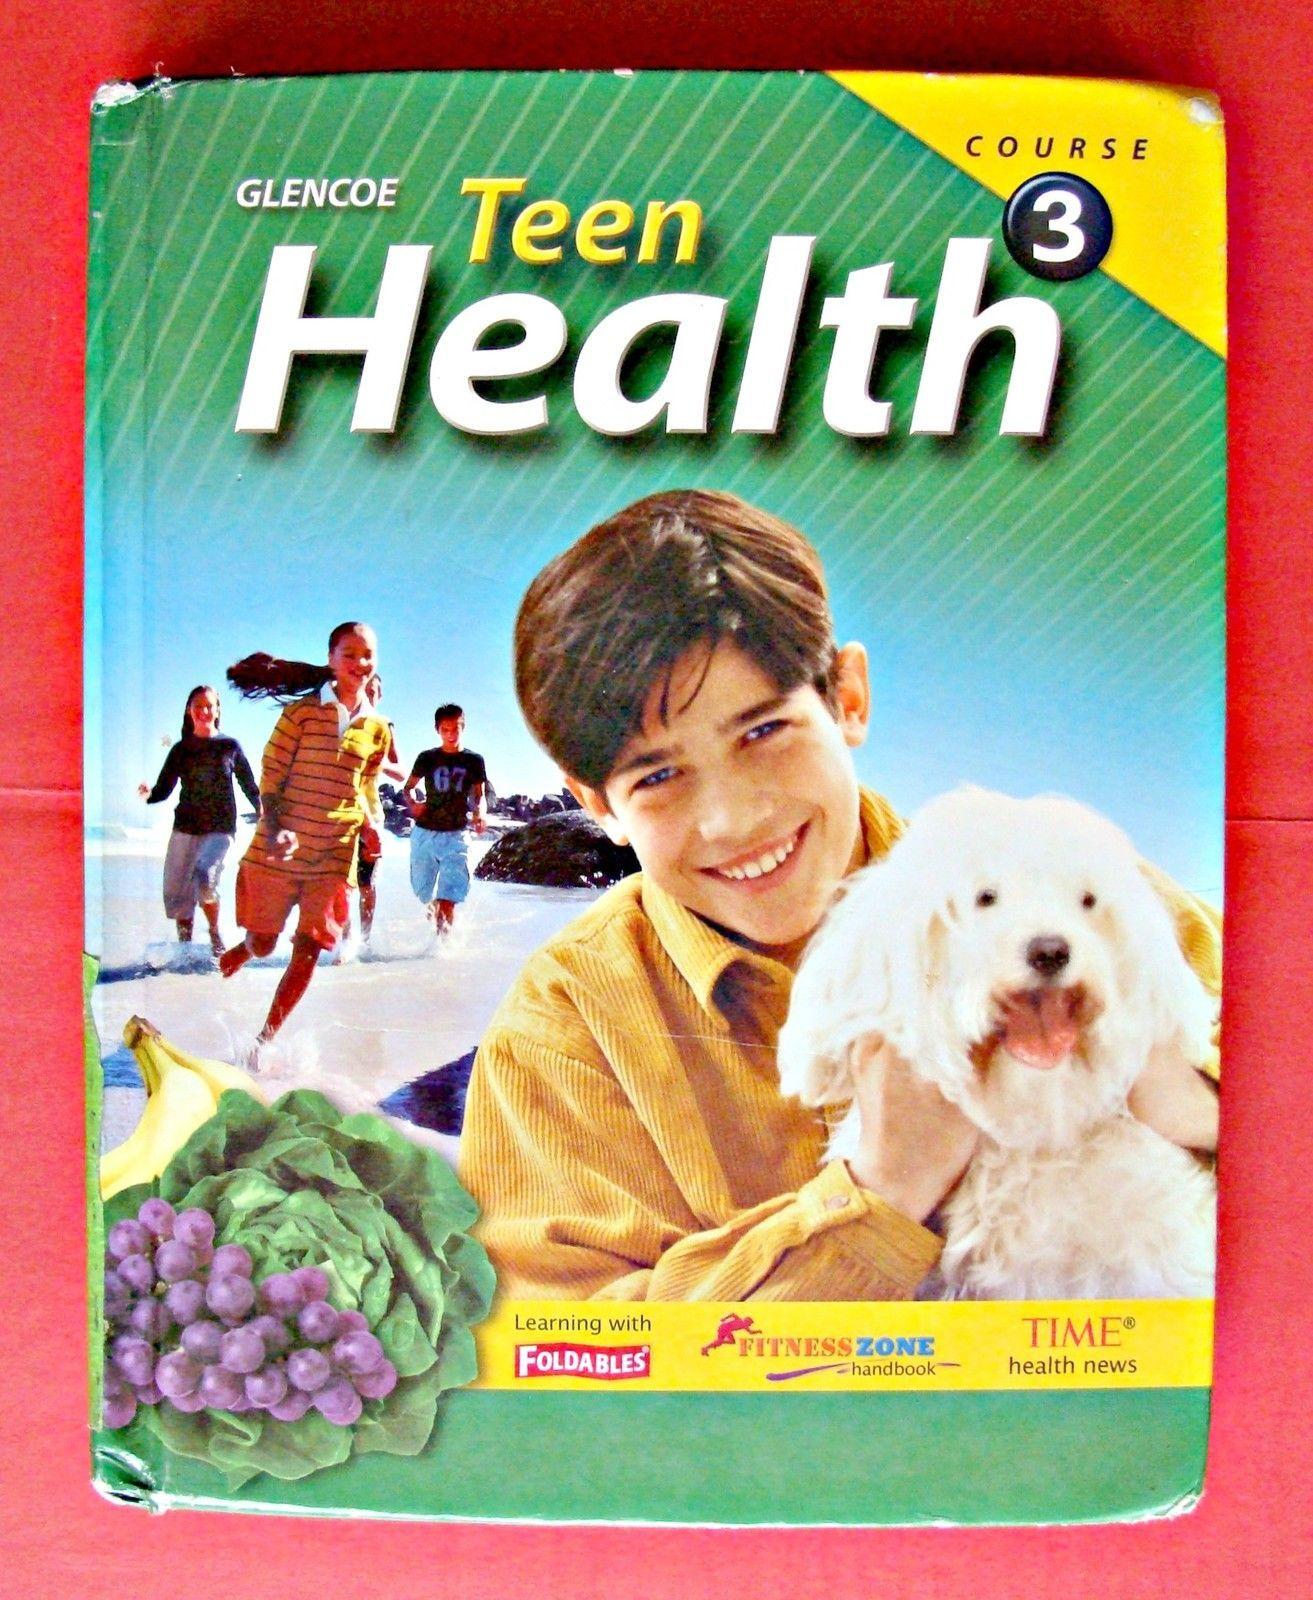 Glencoe Teen Health Course 3 Middle School Textbook Book 7